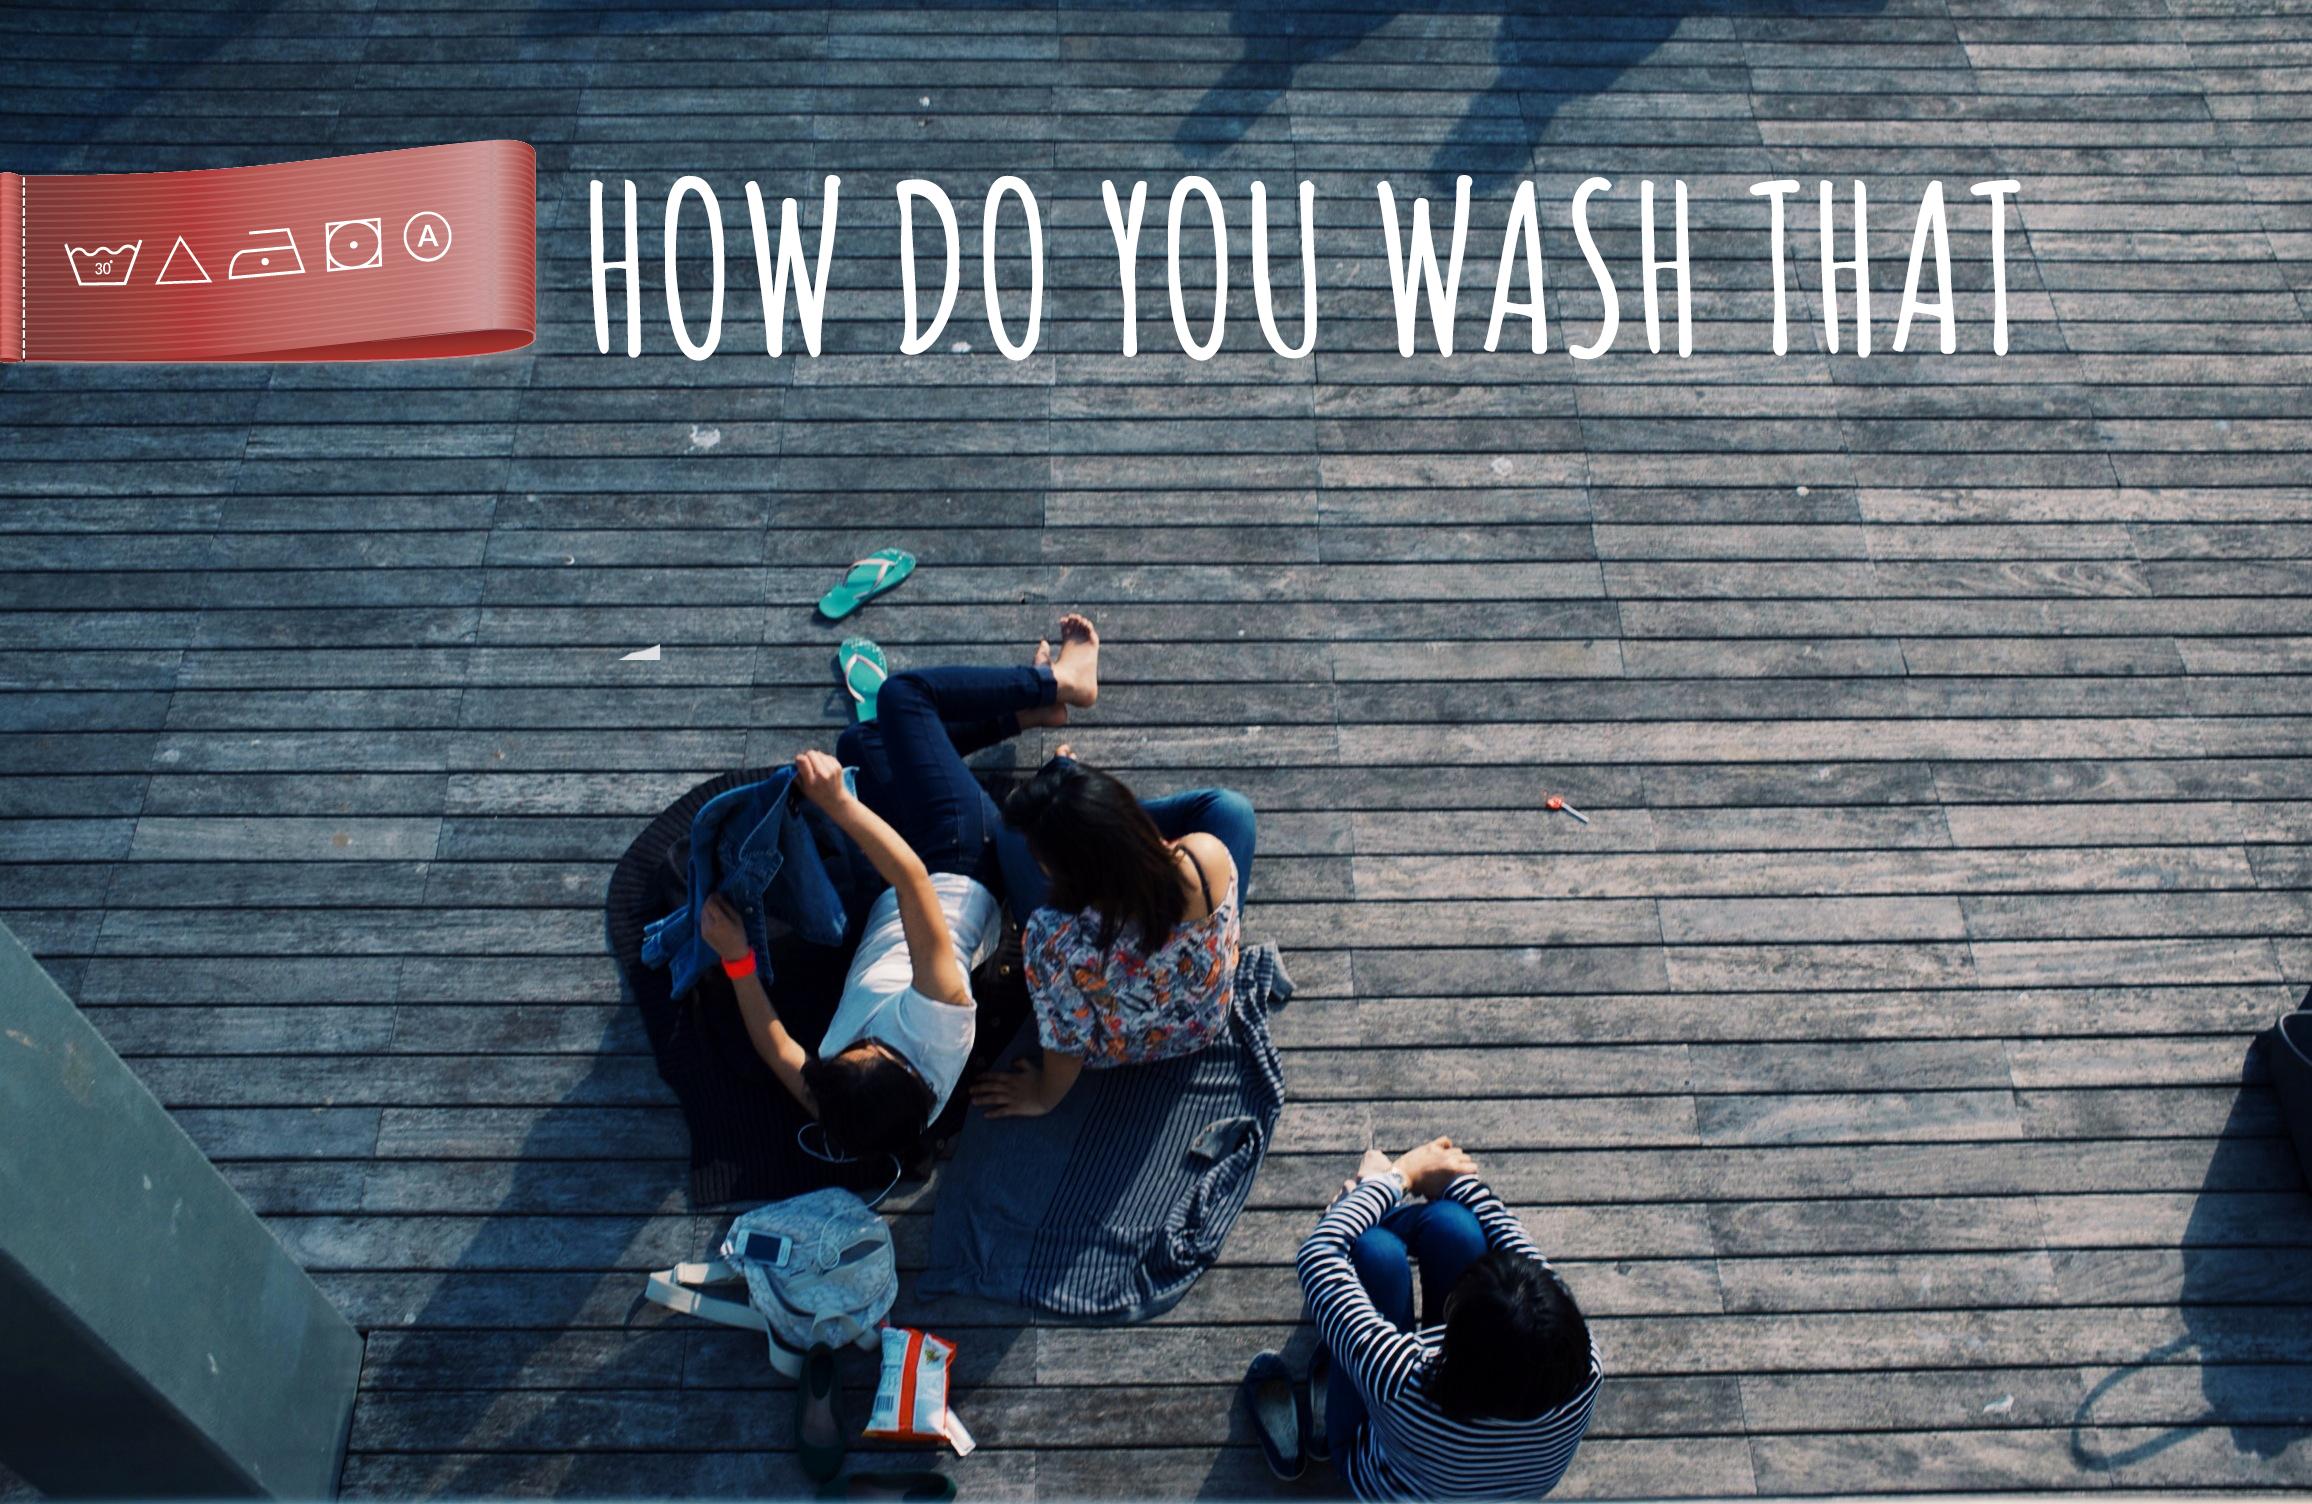 Нови модни лейбъли: HOW DO YOU WASH THAT